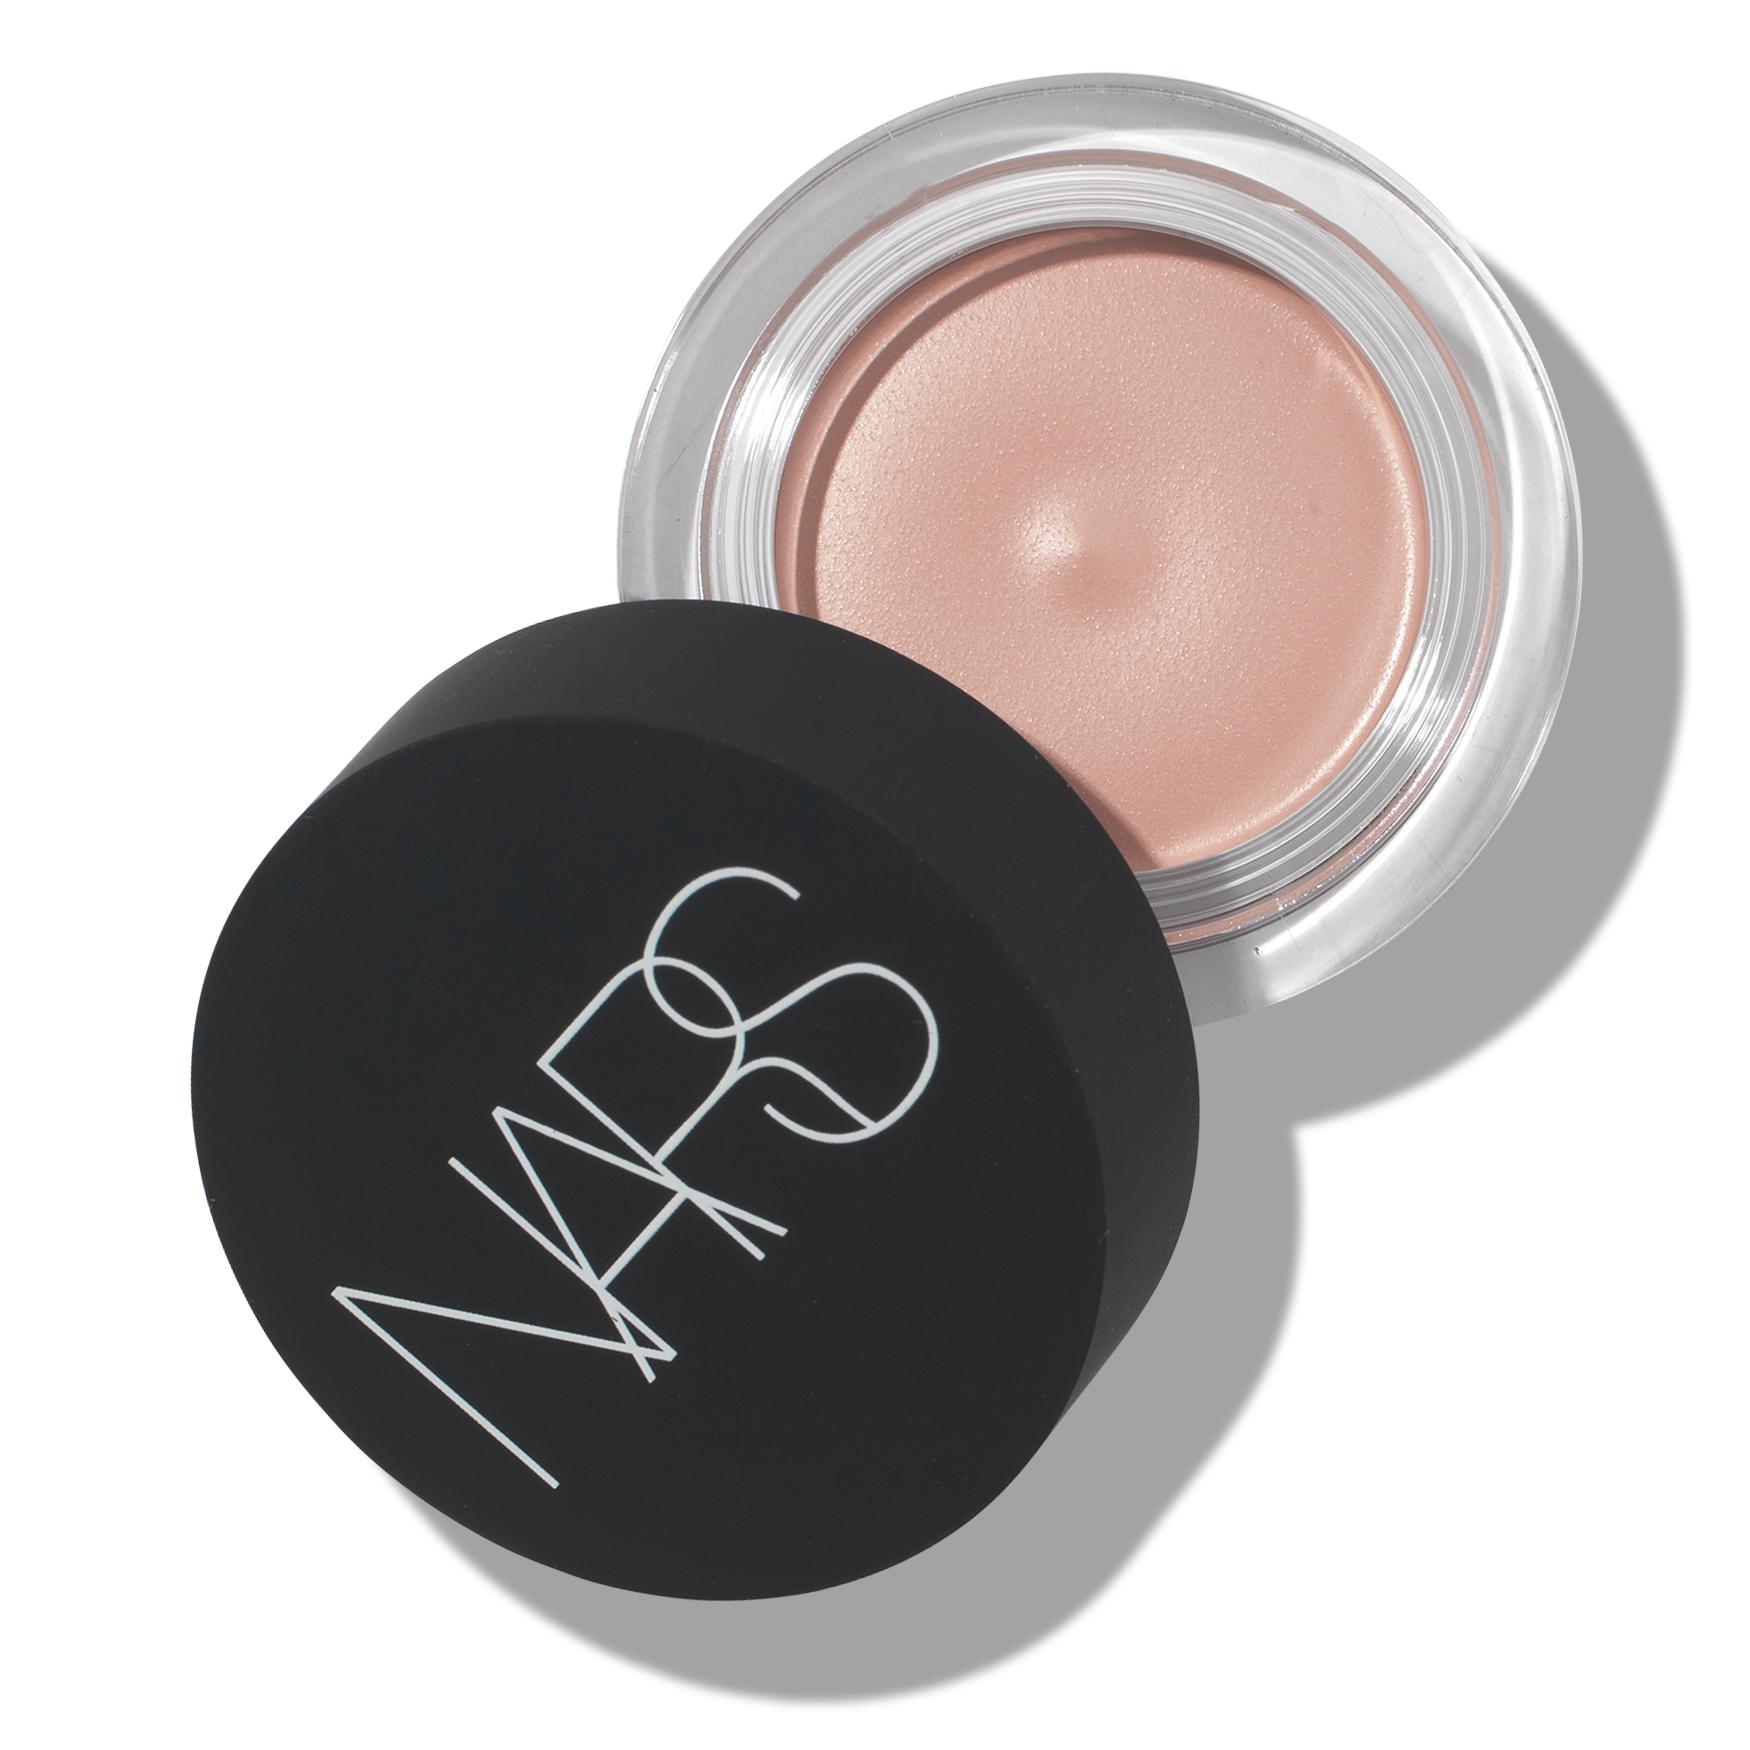 Nars Soft Matte Concealer (Custard)